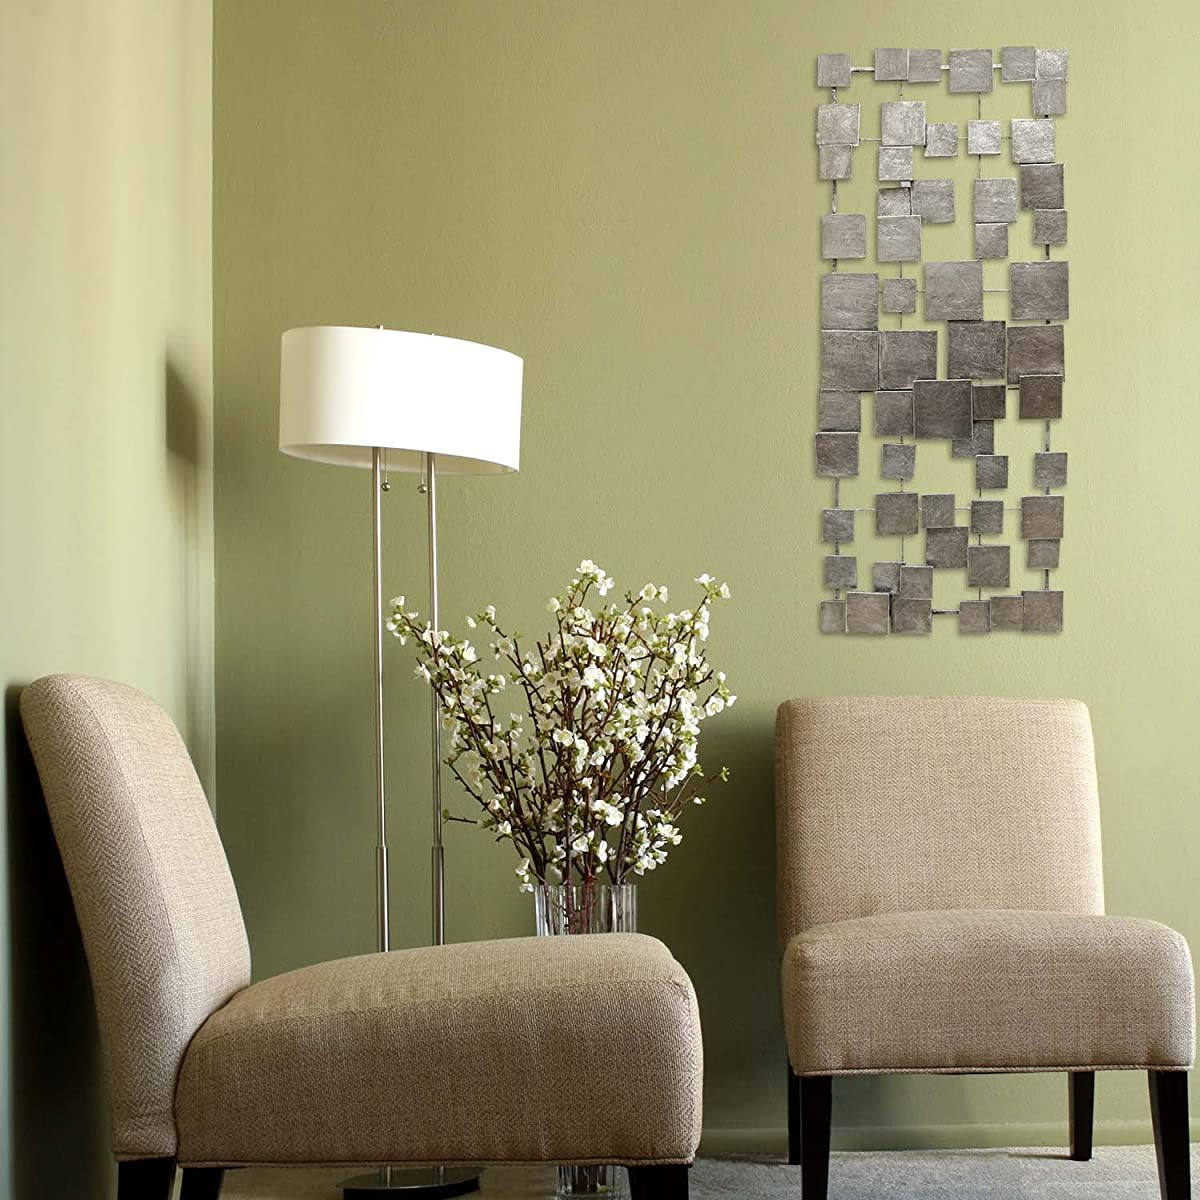 Stratton Home Decor SHD0211 Geometric Tiles Wall Decor